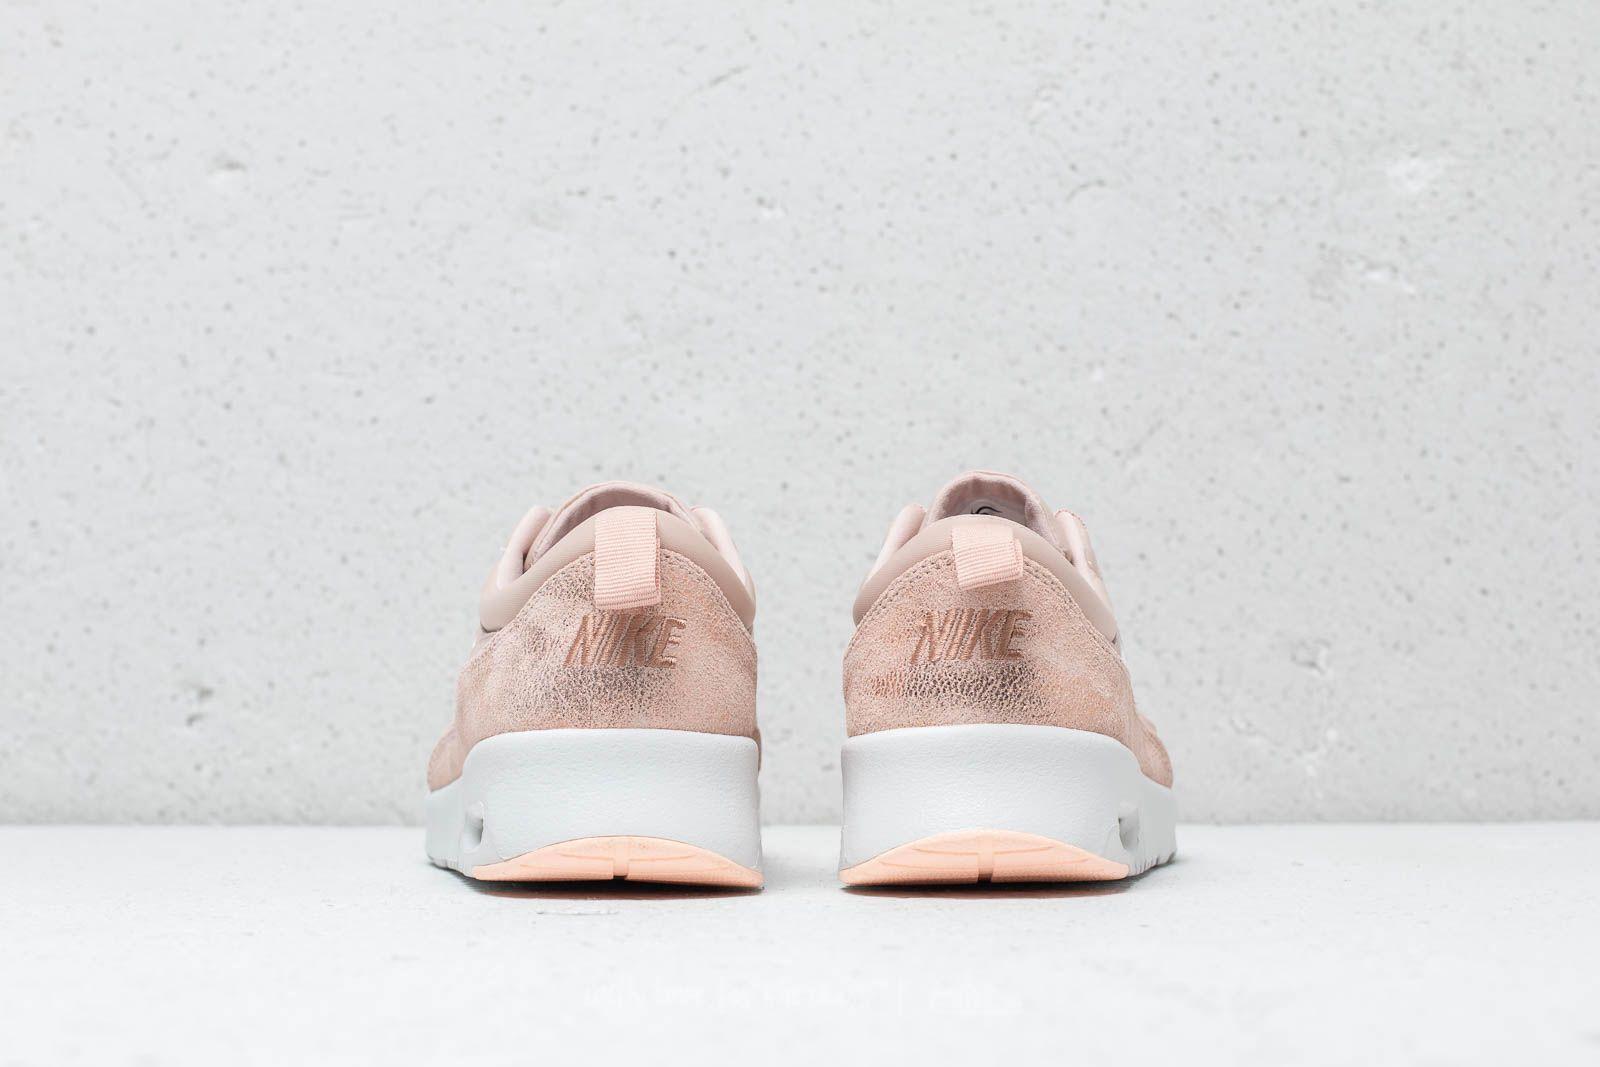 Nike Women's Air Max Thea Premium Sneakers Particle BeigeParticle Beige